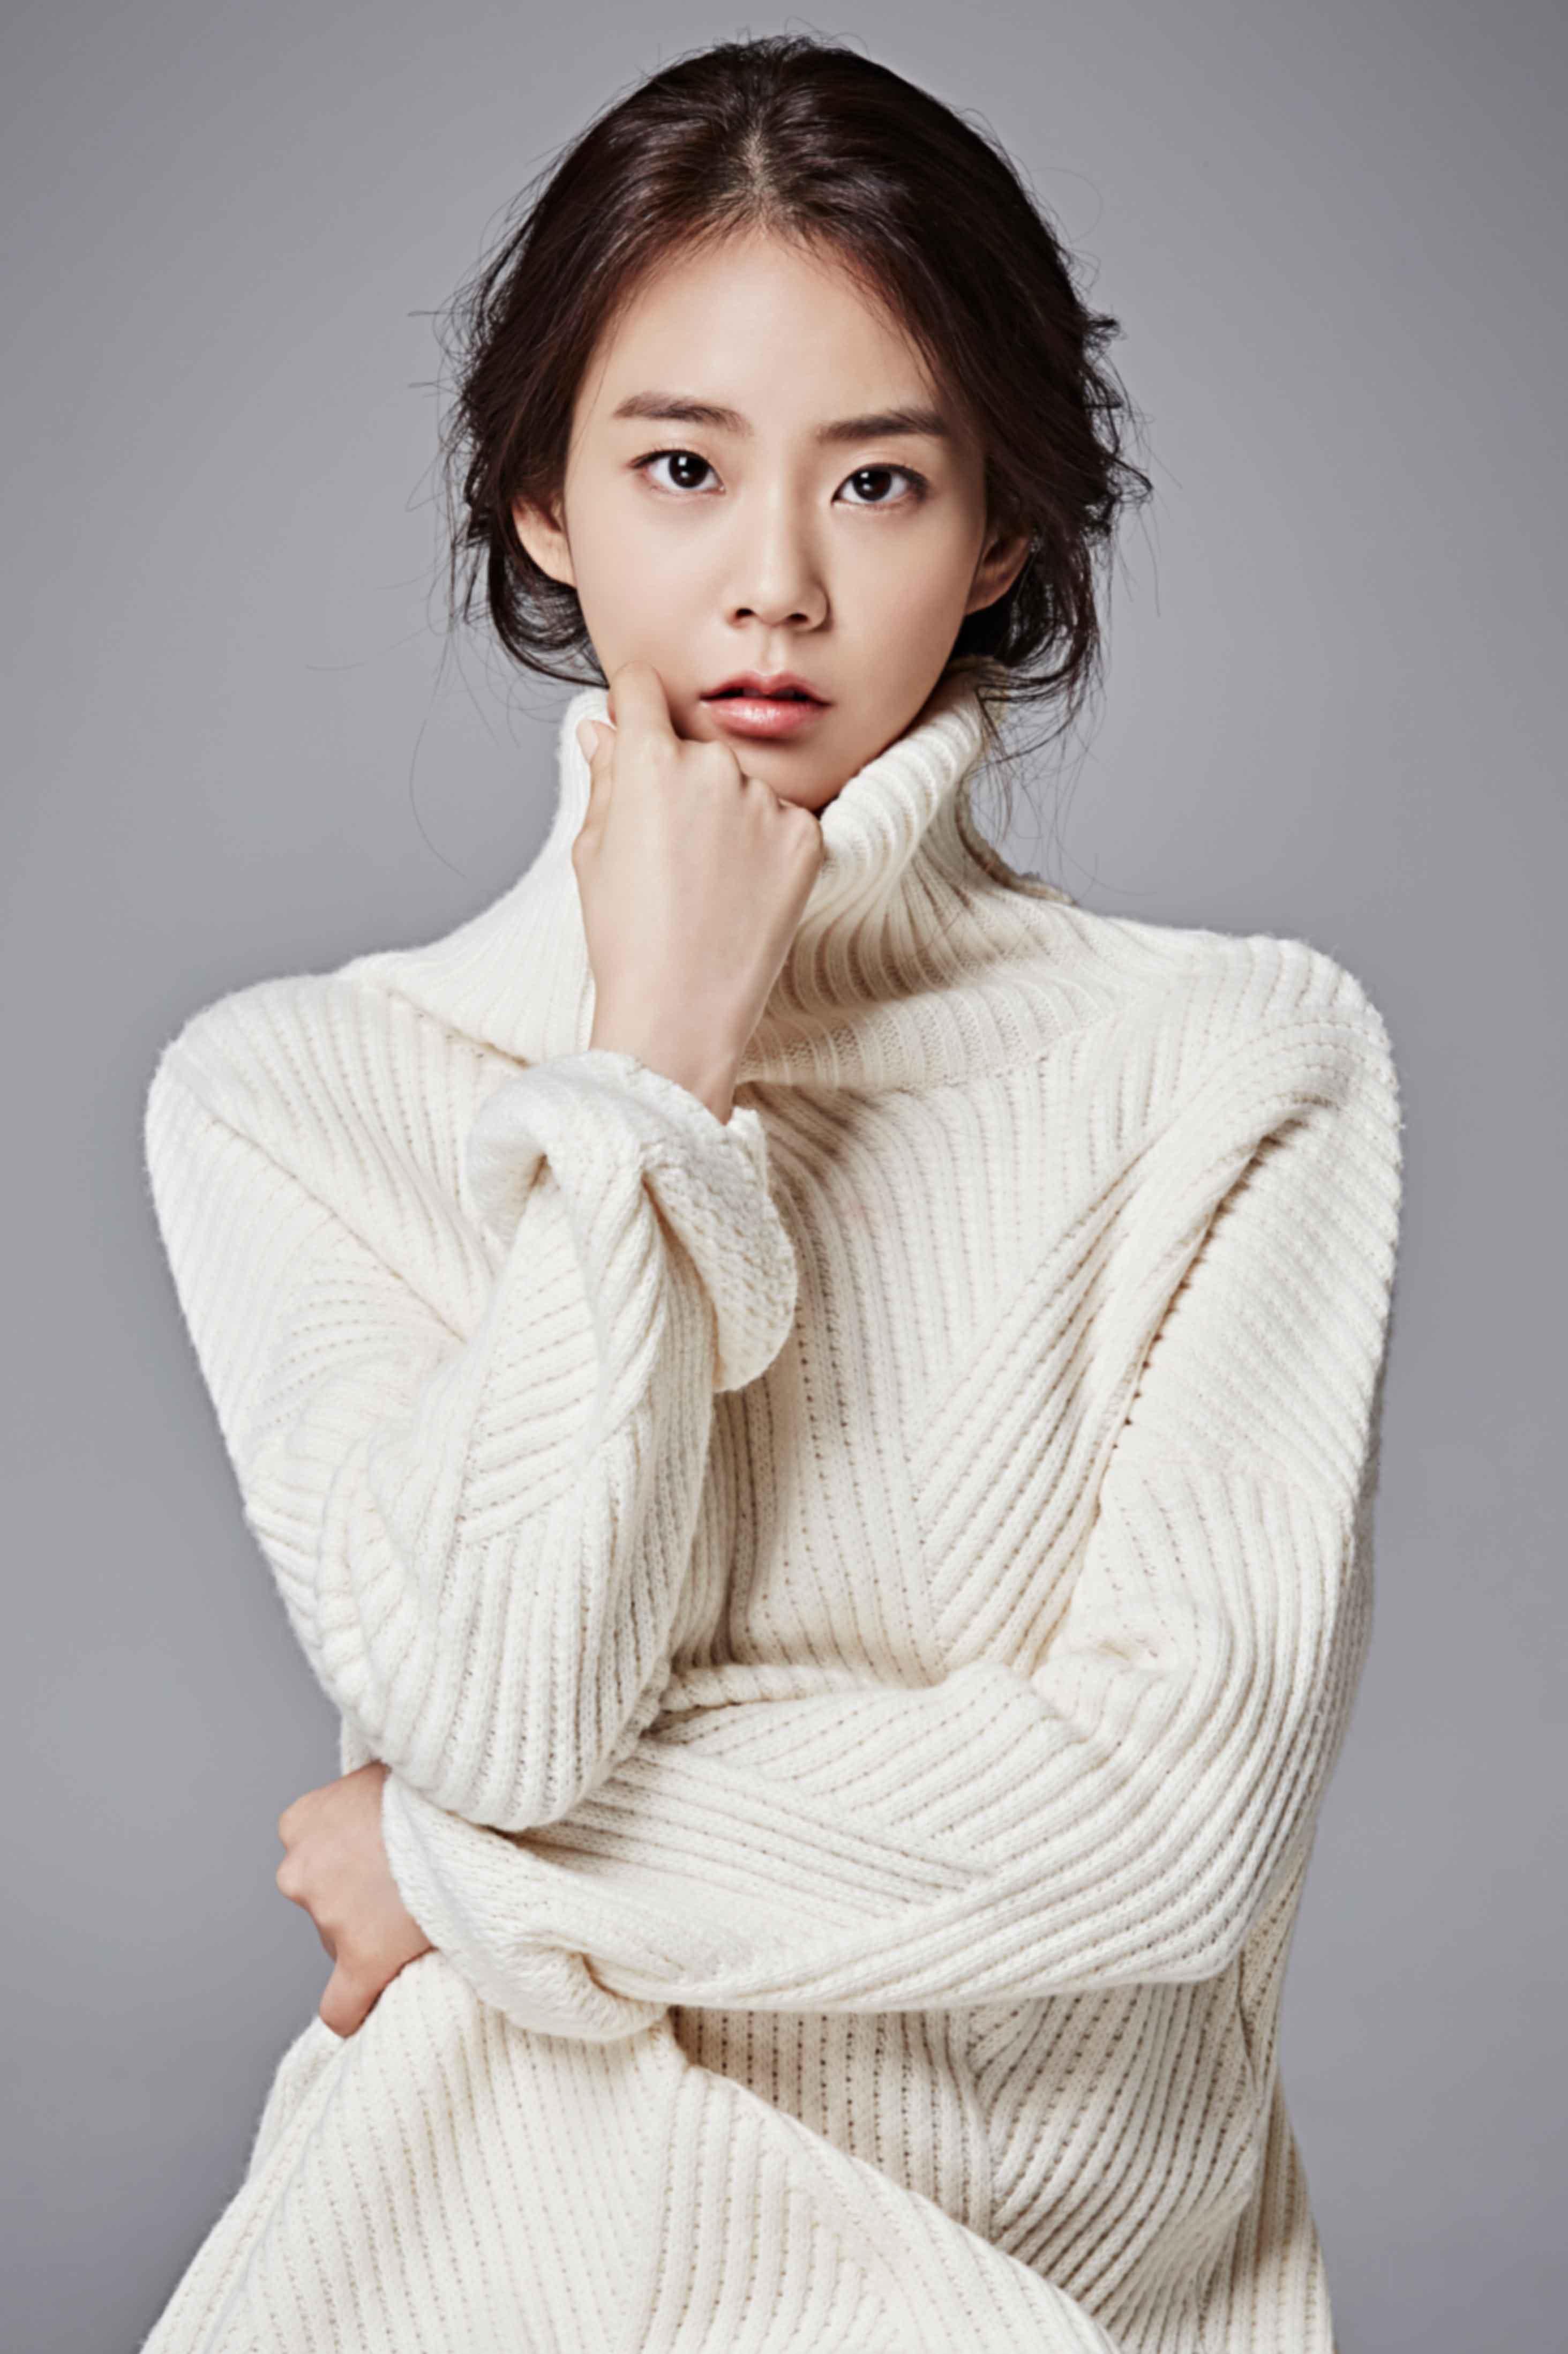 beautiful girl - Han Seung Youn